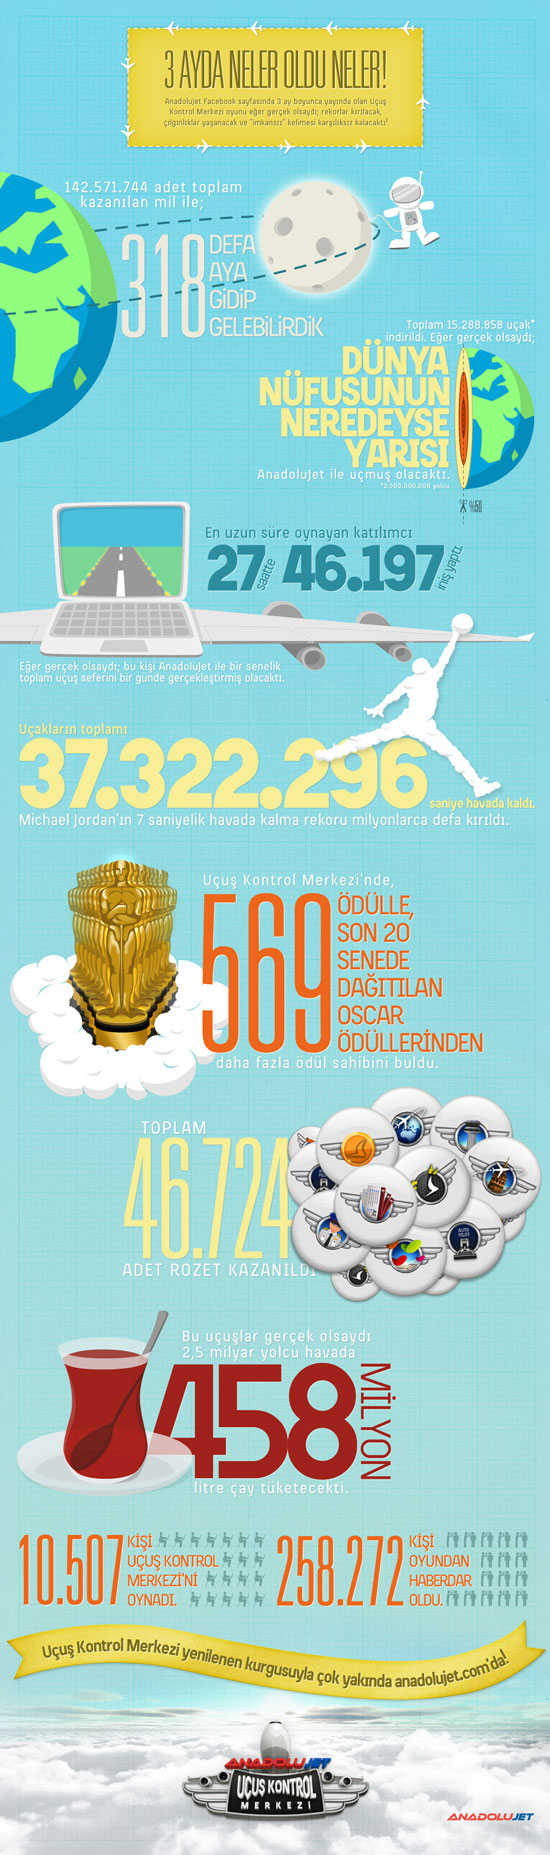 AnadoluJet_UKM_Infografik-elmaaltshift